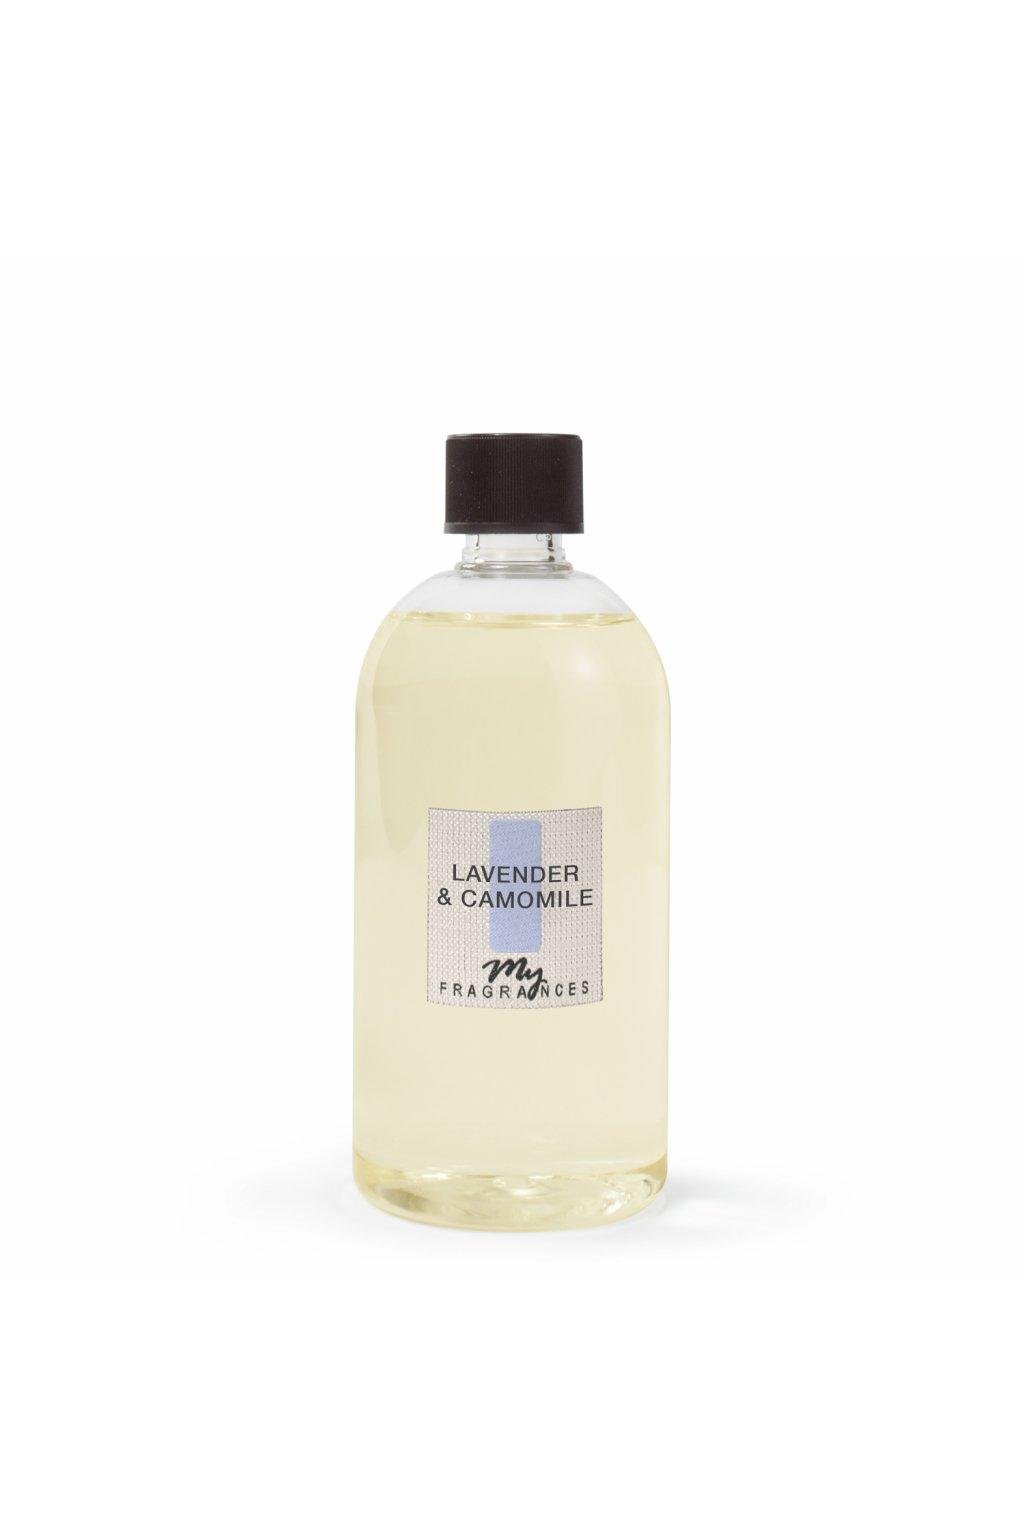 588 myf napln pro aromaticky difuzer levander canomile levandule a hermanek 500ml